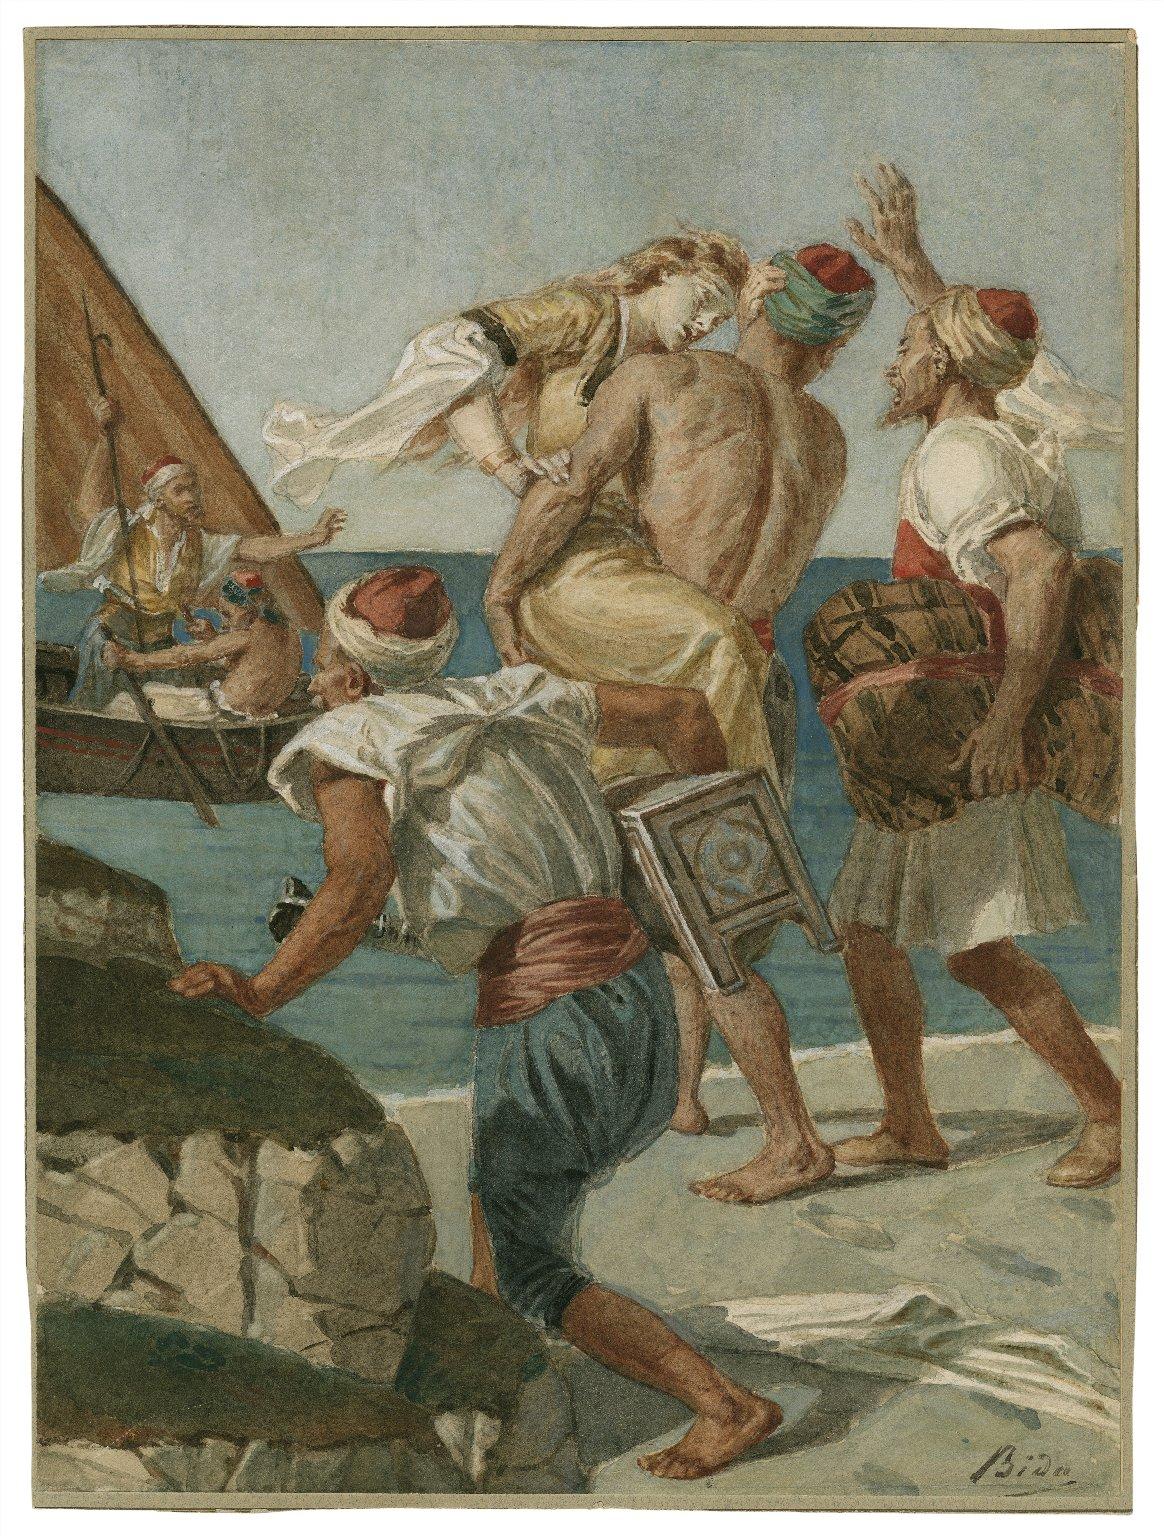 [Pericles] [graphic] / Bida.